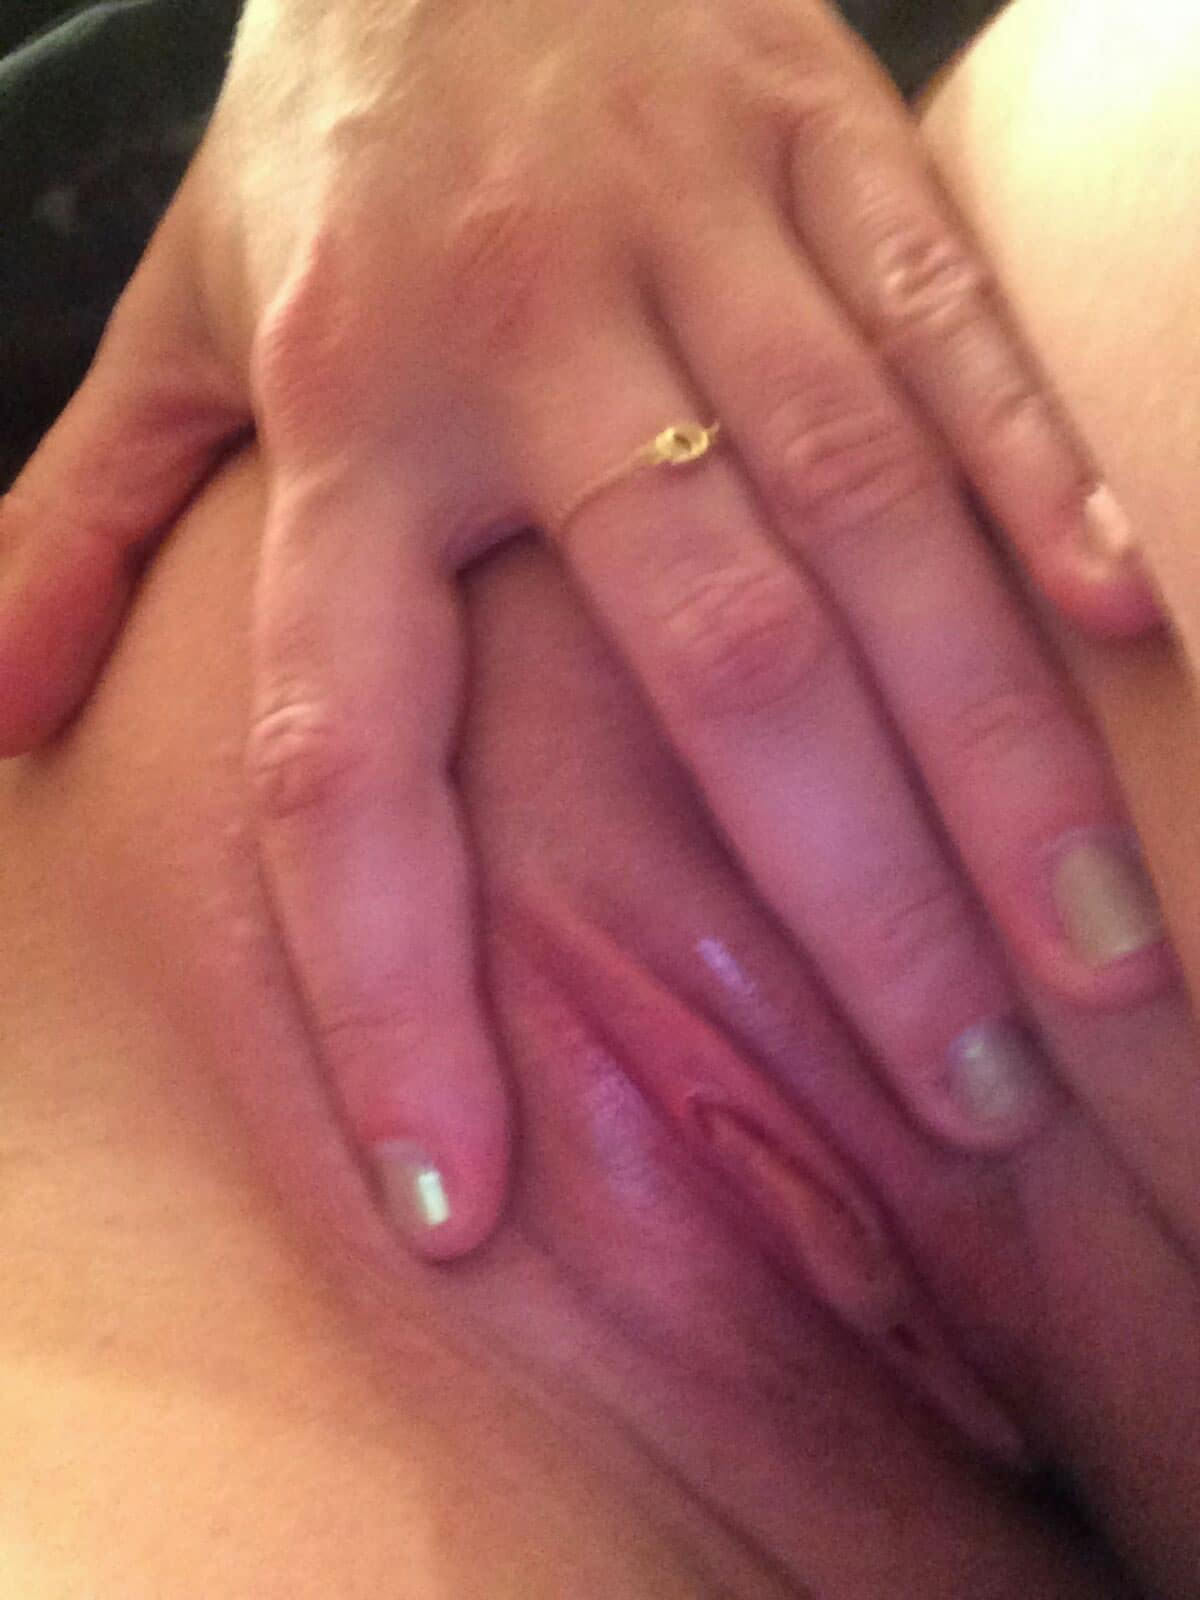 AJ Michalka grabbing pussy